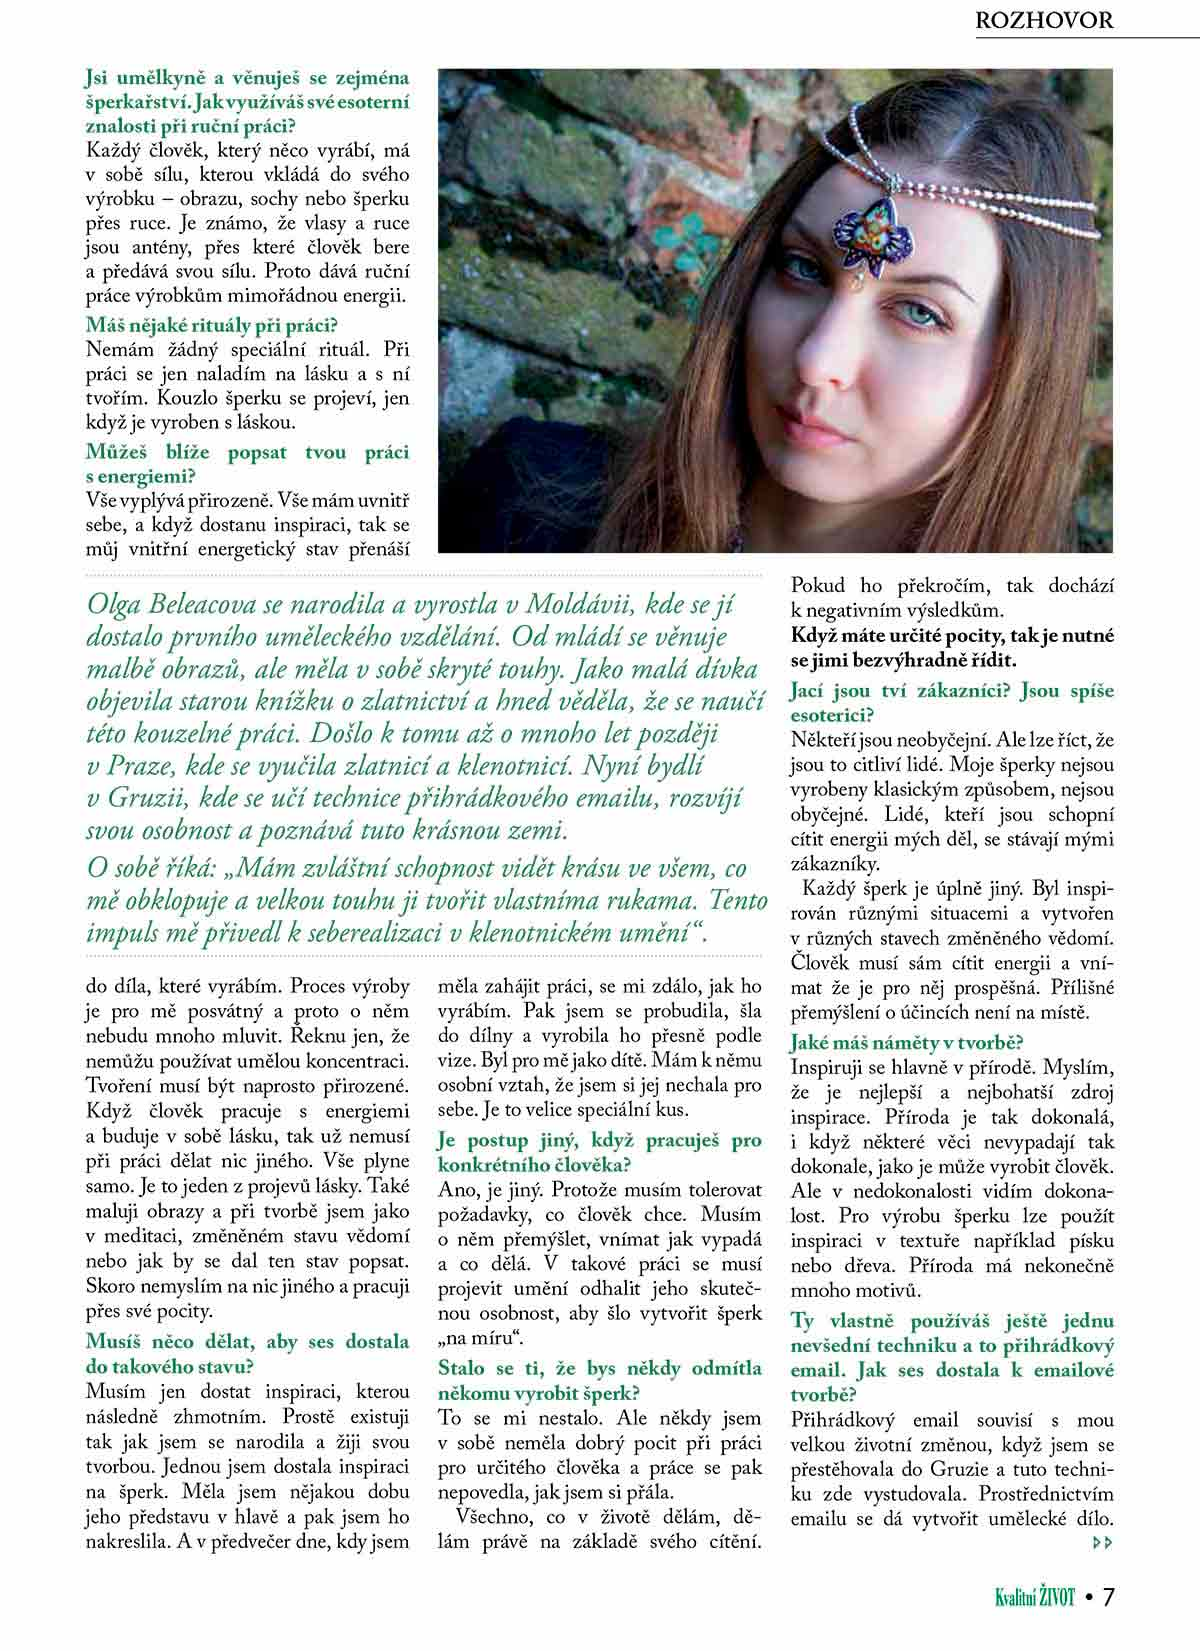 Kvalitni-zivot__2014_Omalgami-Olga-Beleacova-jeweler-Exclusive-Jewelry-Silver-diamond-2-min